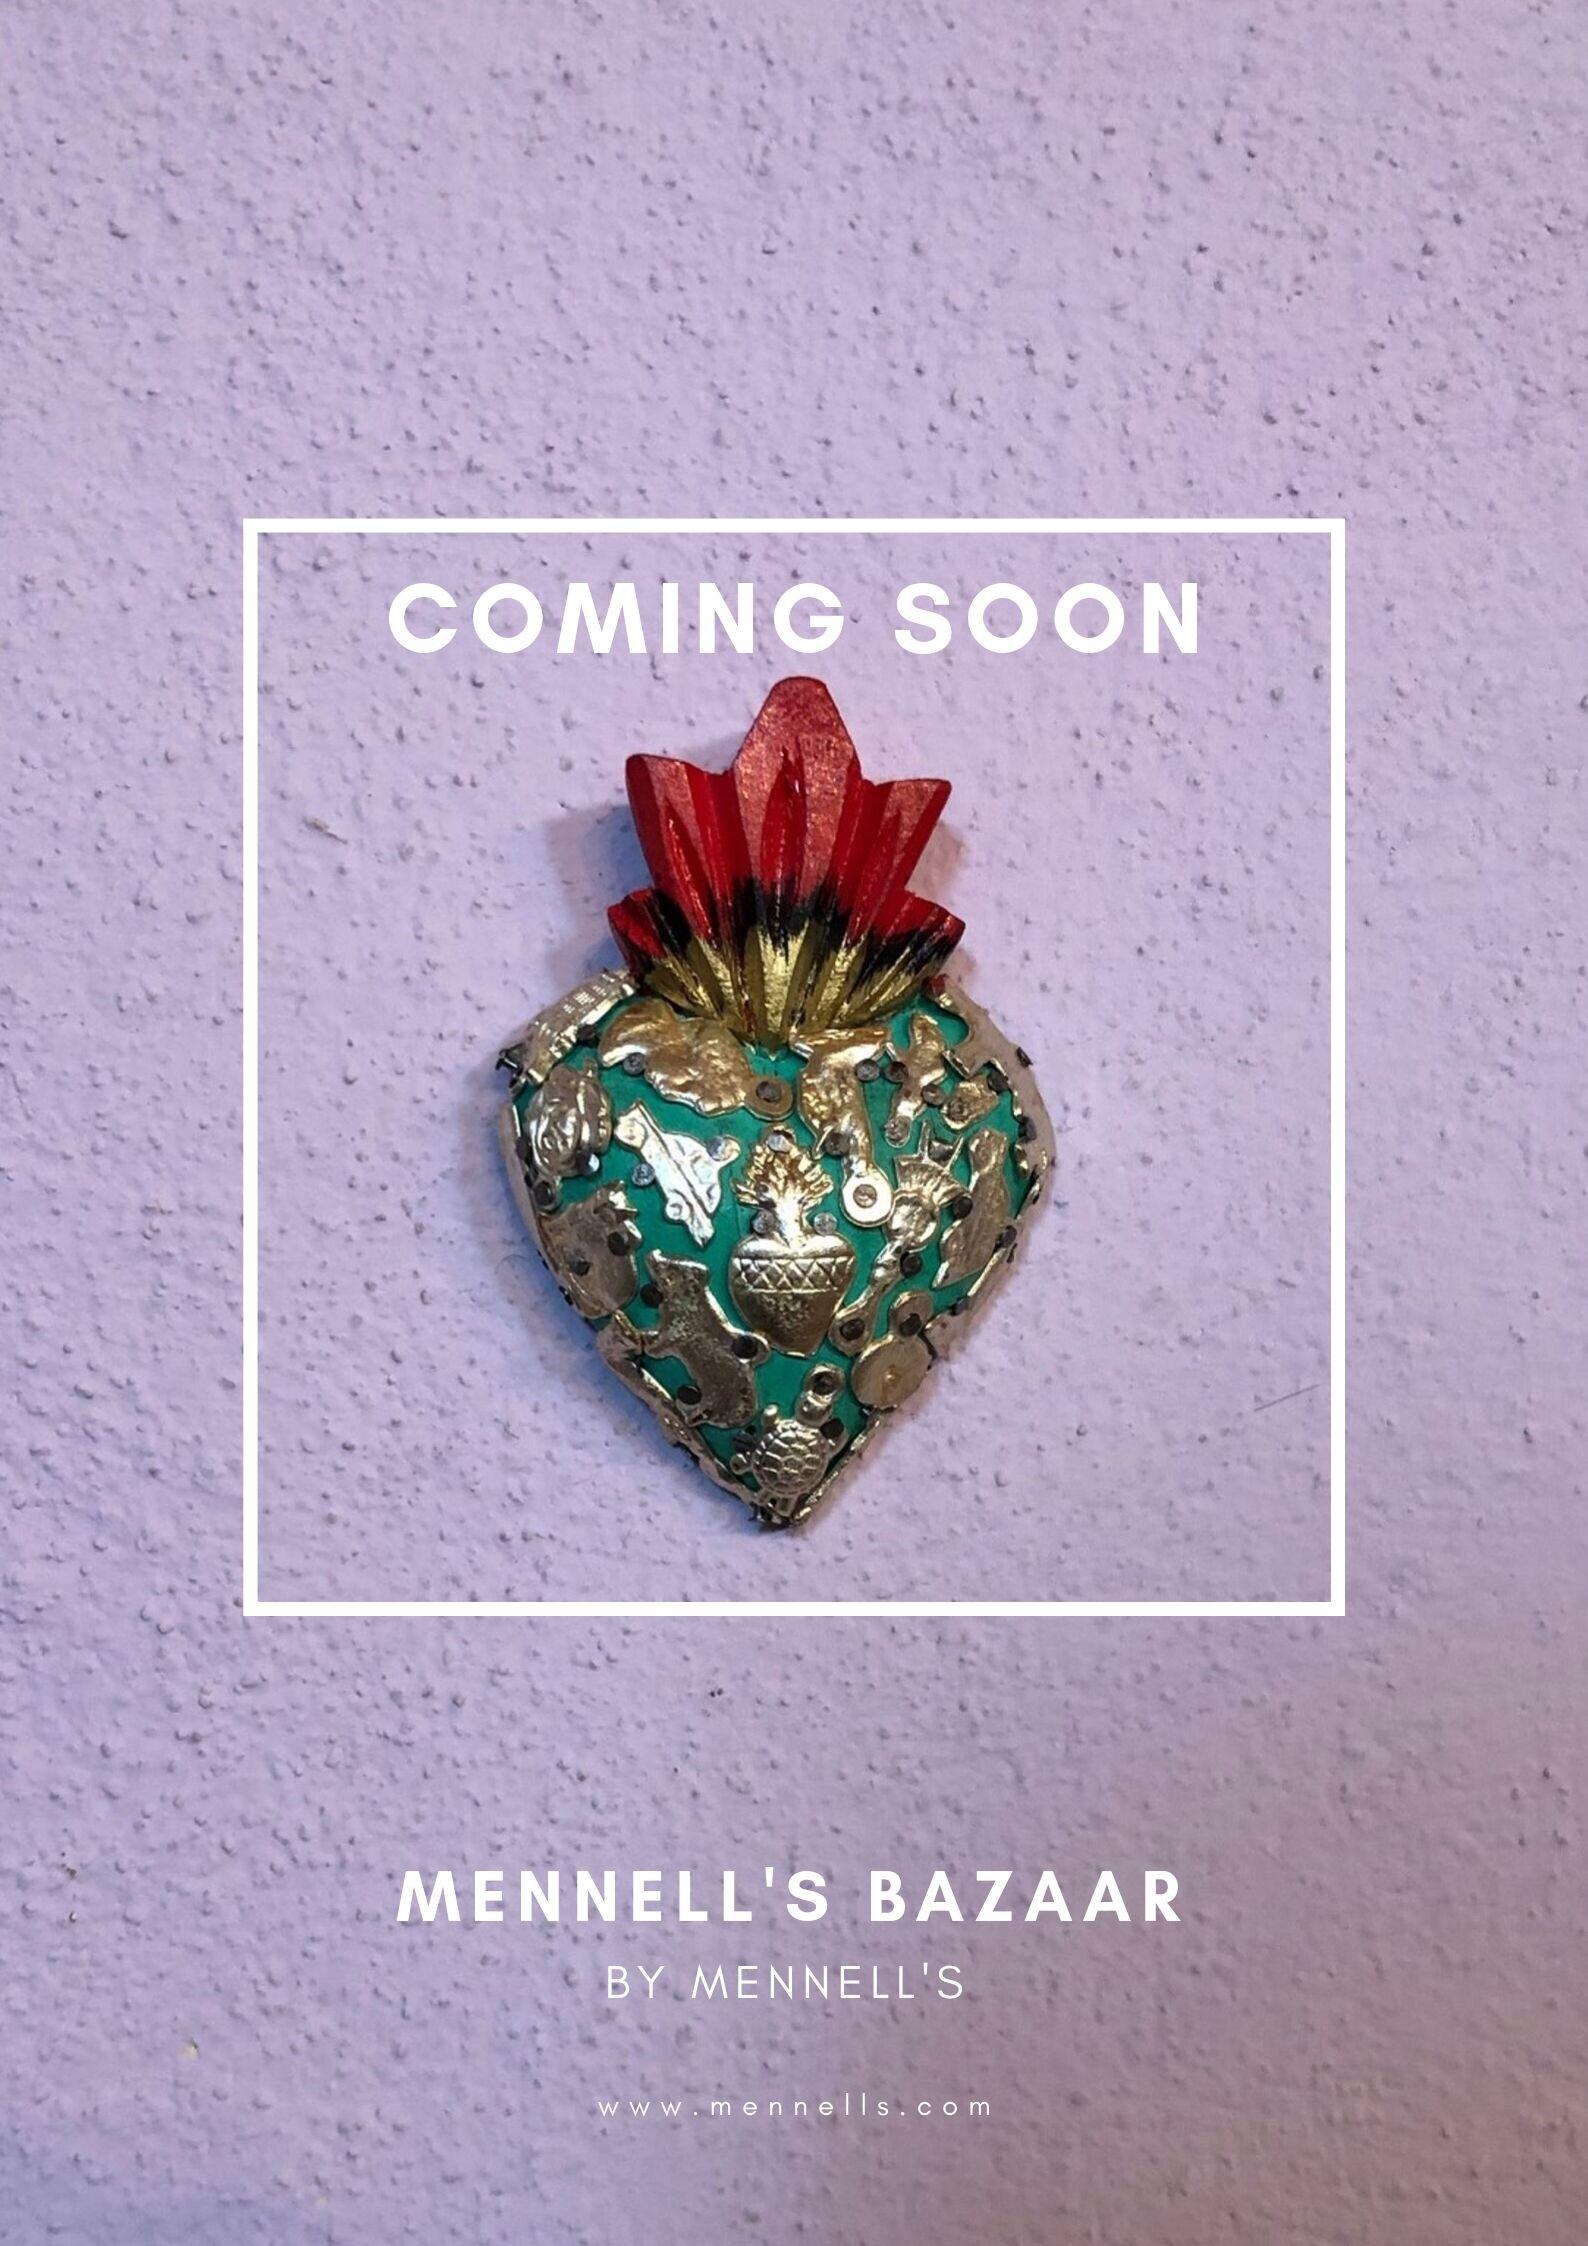 Mennell's Bazaar Coming Soon.jpg